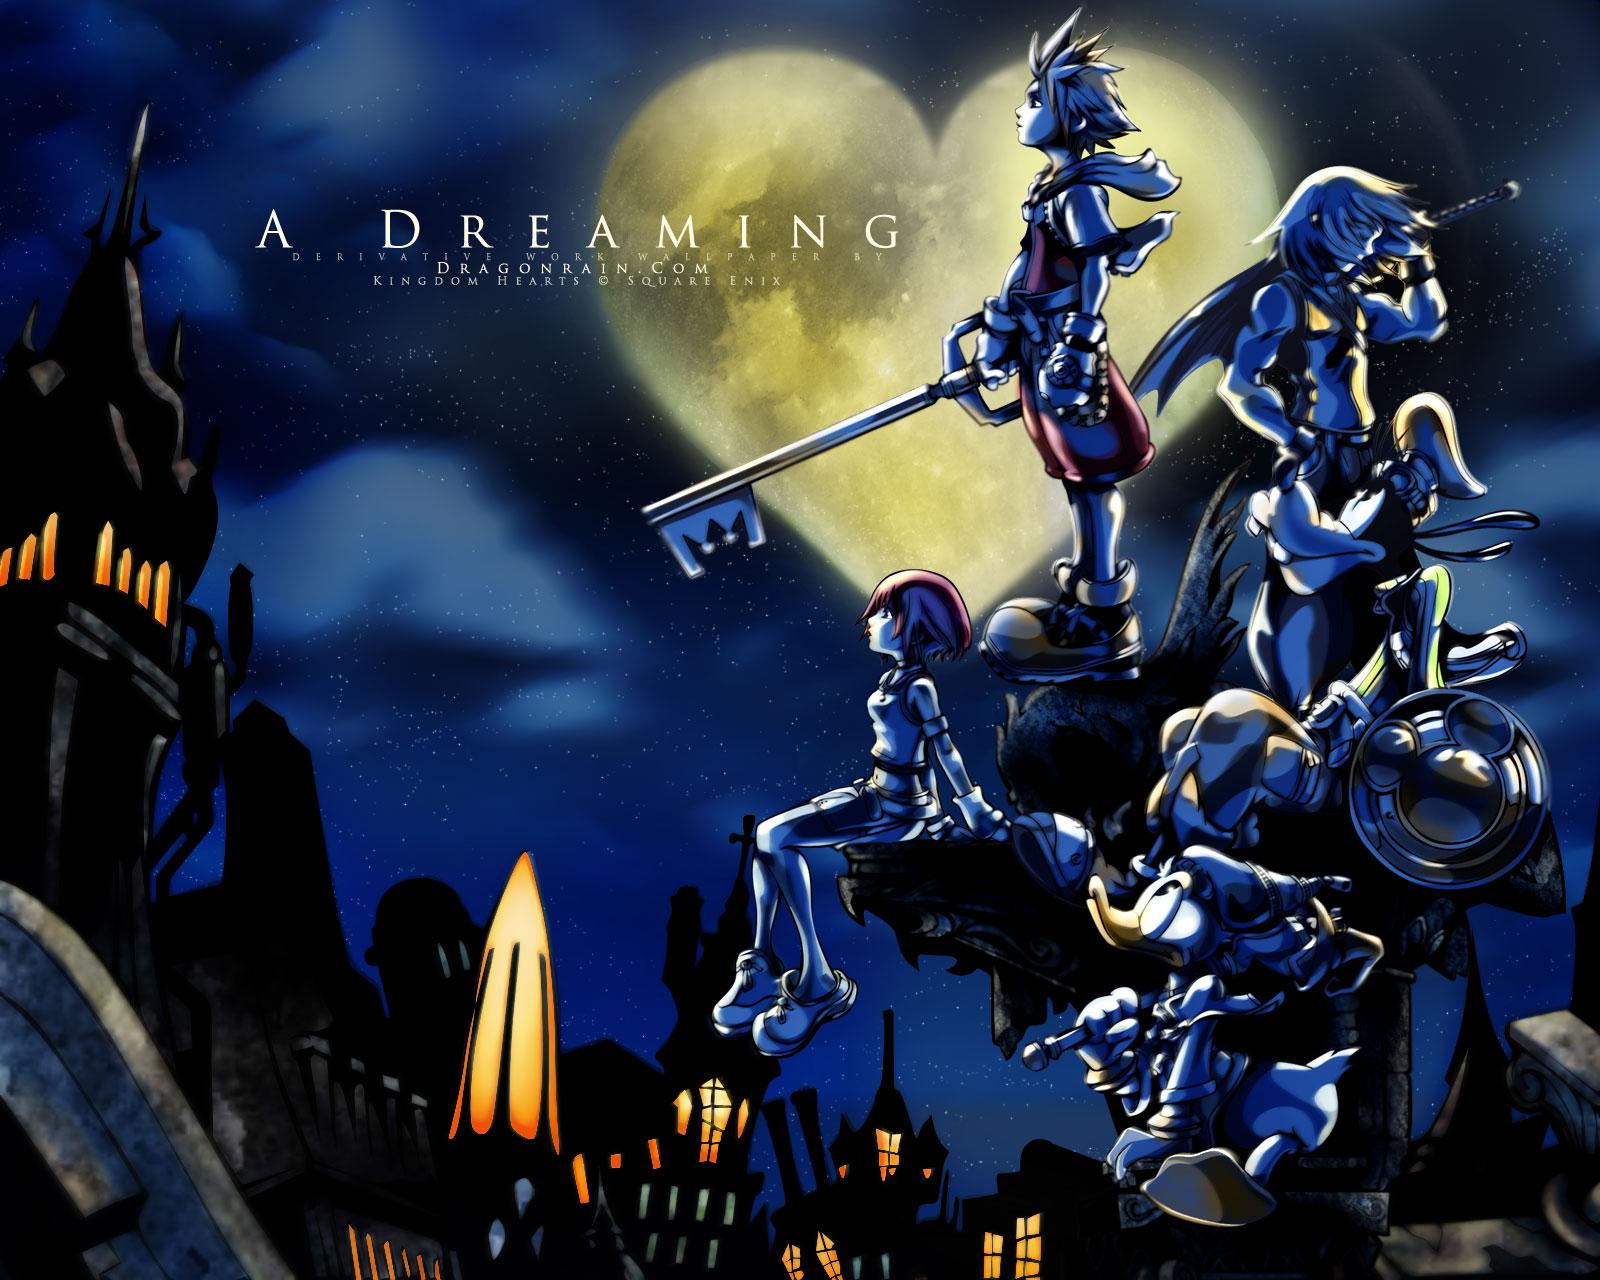 Fandoms Kingdom Hearts 1600x1280